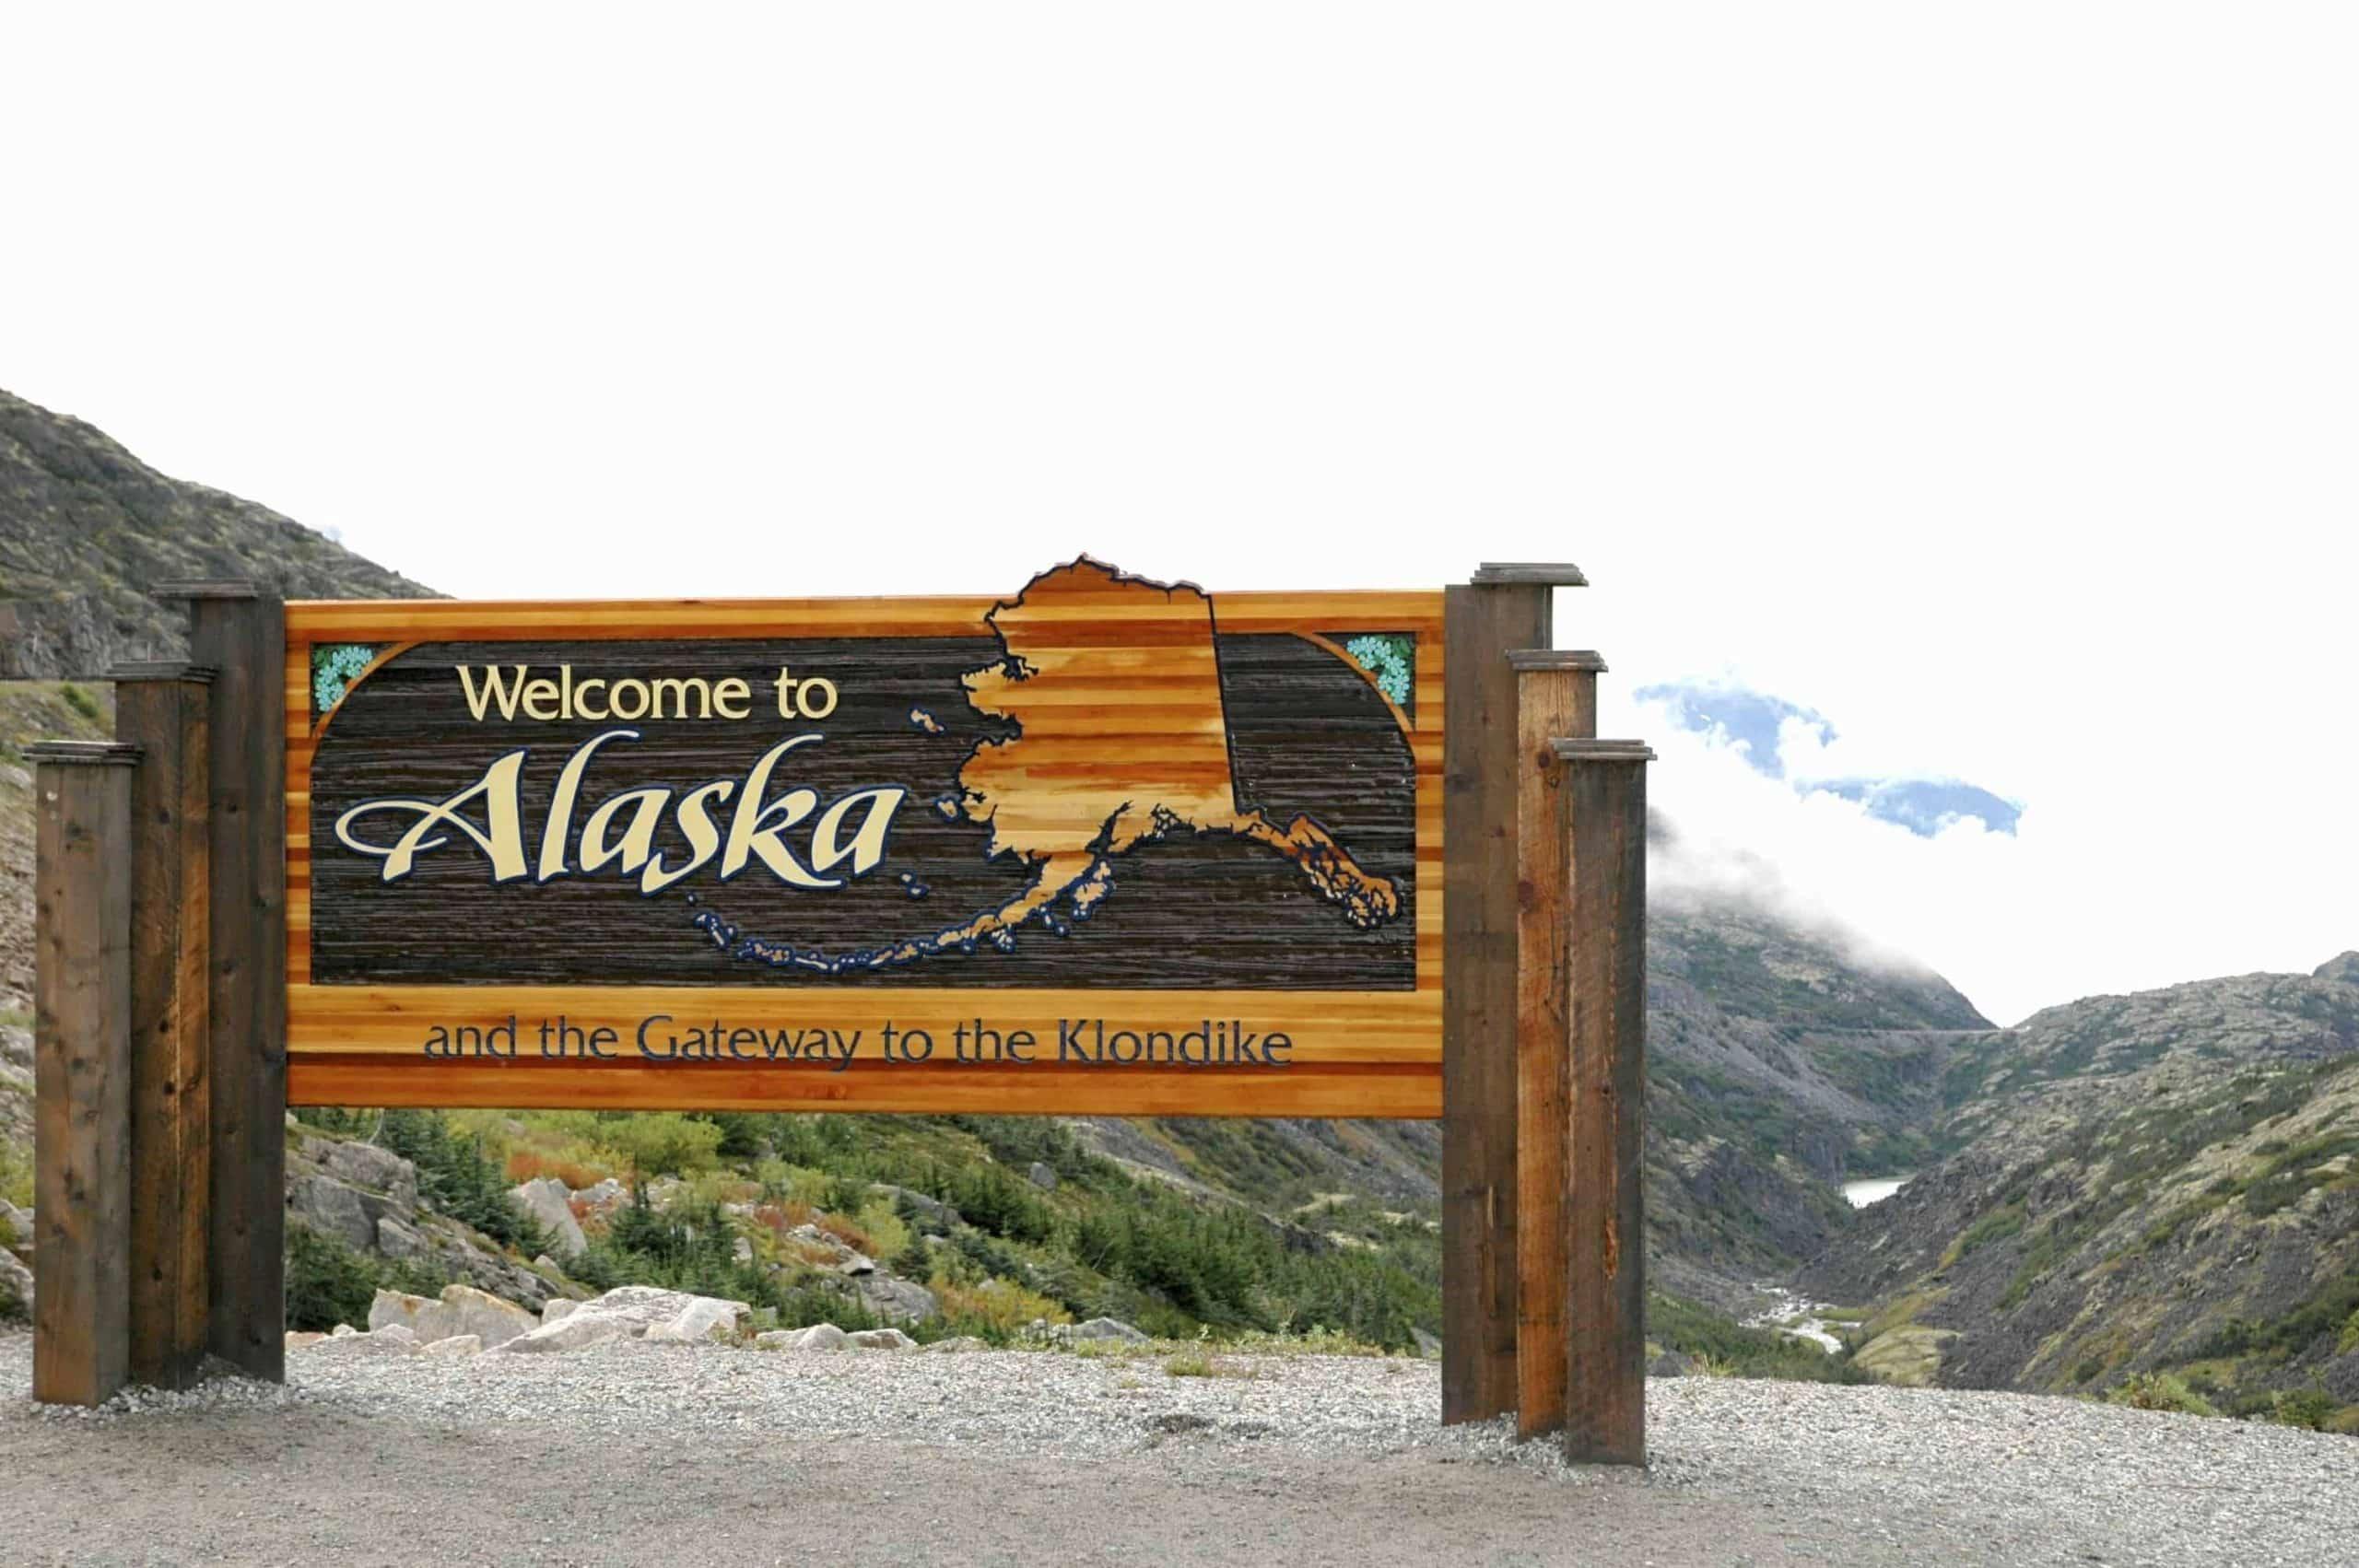 Velkommen til Alaska - USA - Risskov Rejser